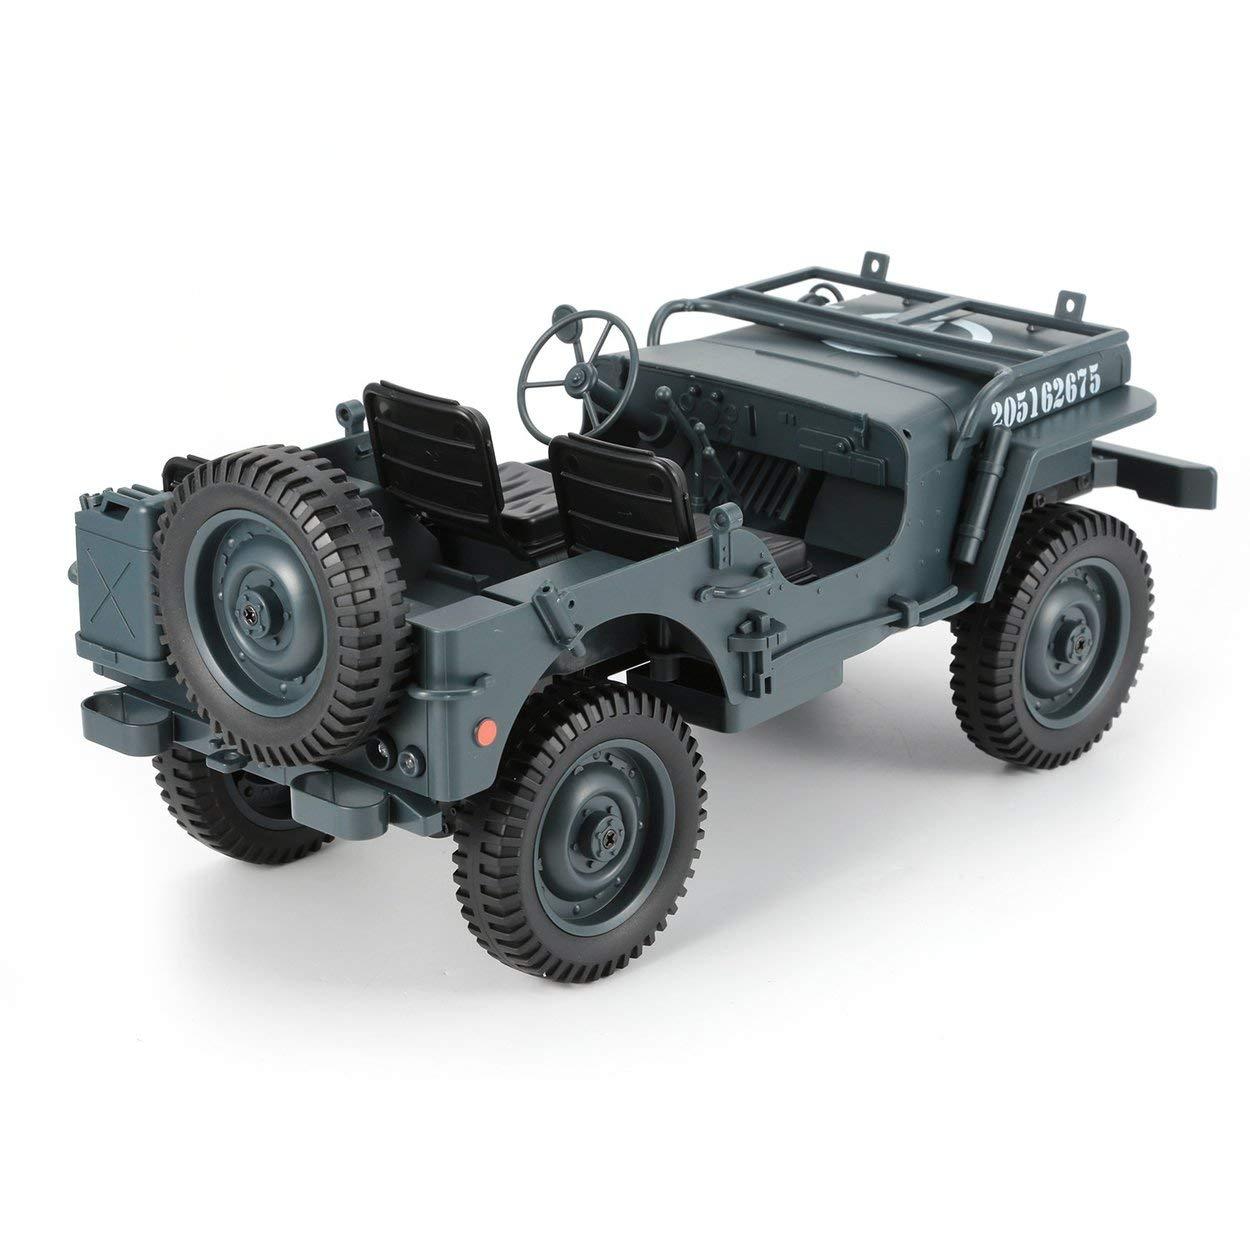 Lorenlli C606 1:10 RC Car 2.4G 4WD Convertible Control Remoto de luz Jeep 4 Ruedas motrices Off-Road Militar Escalada Coche de Juguete Kid Regalo